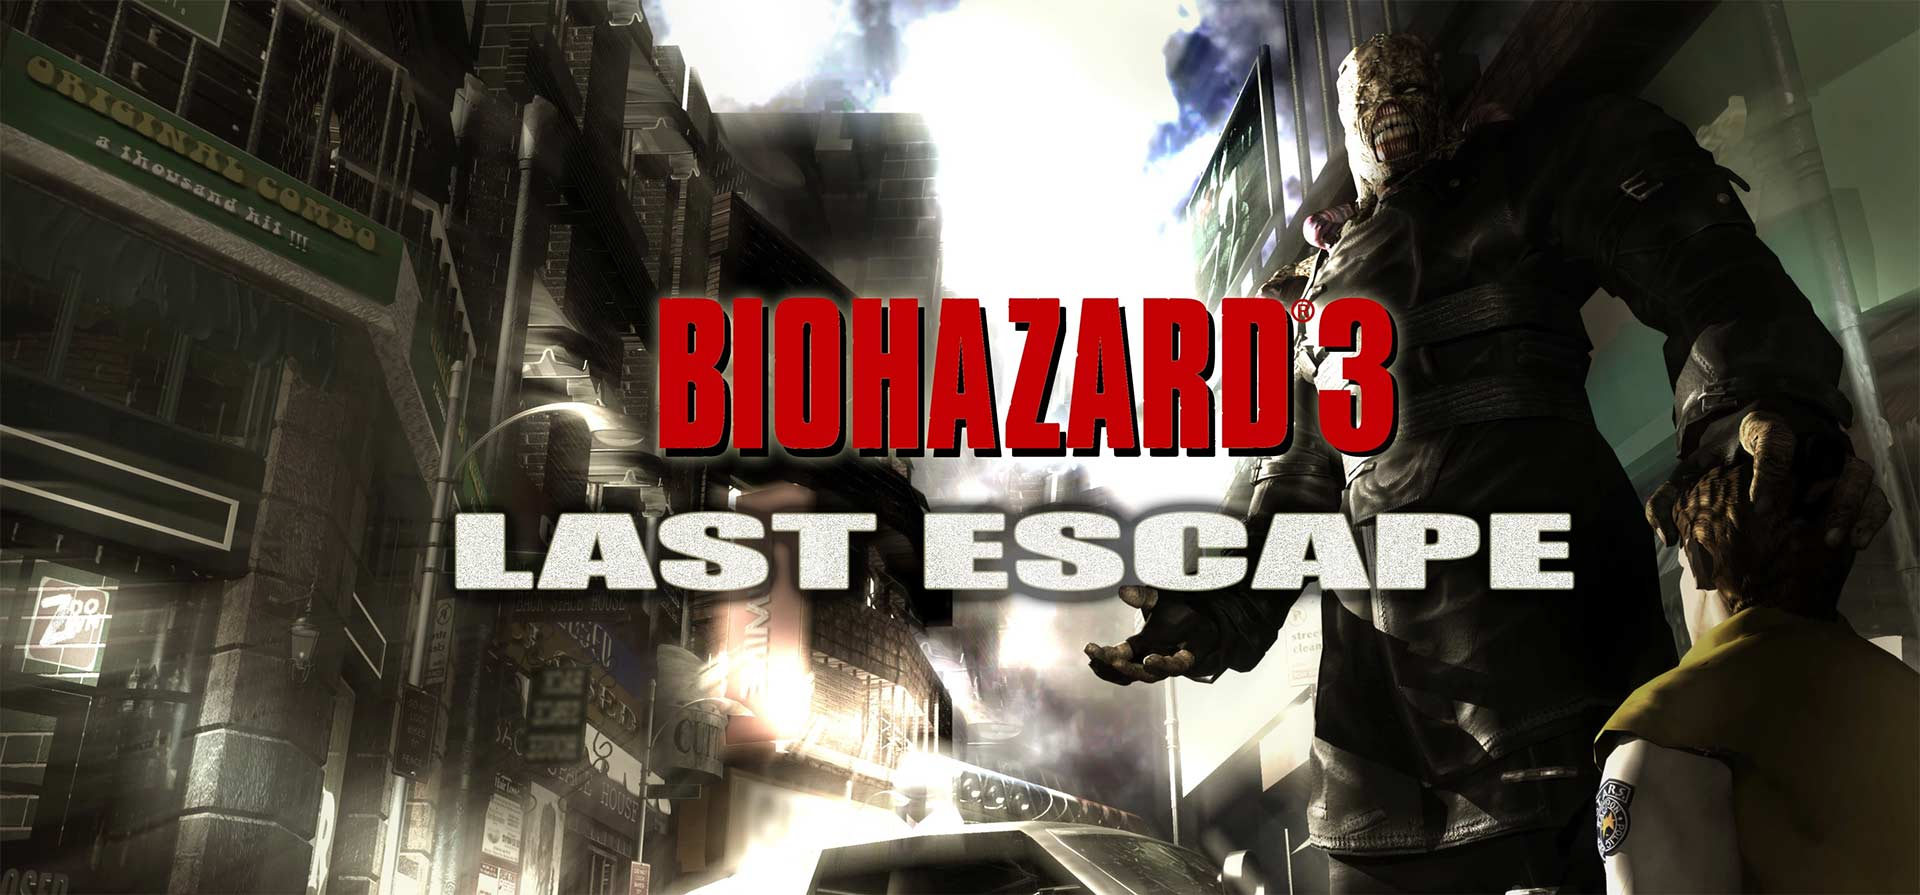 Biohazard 3.